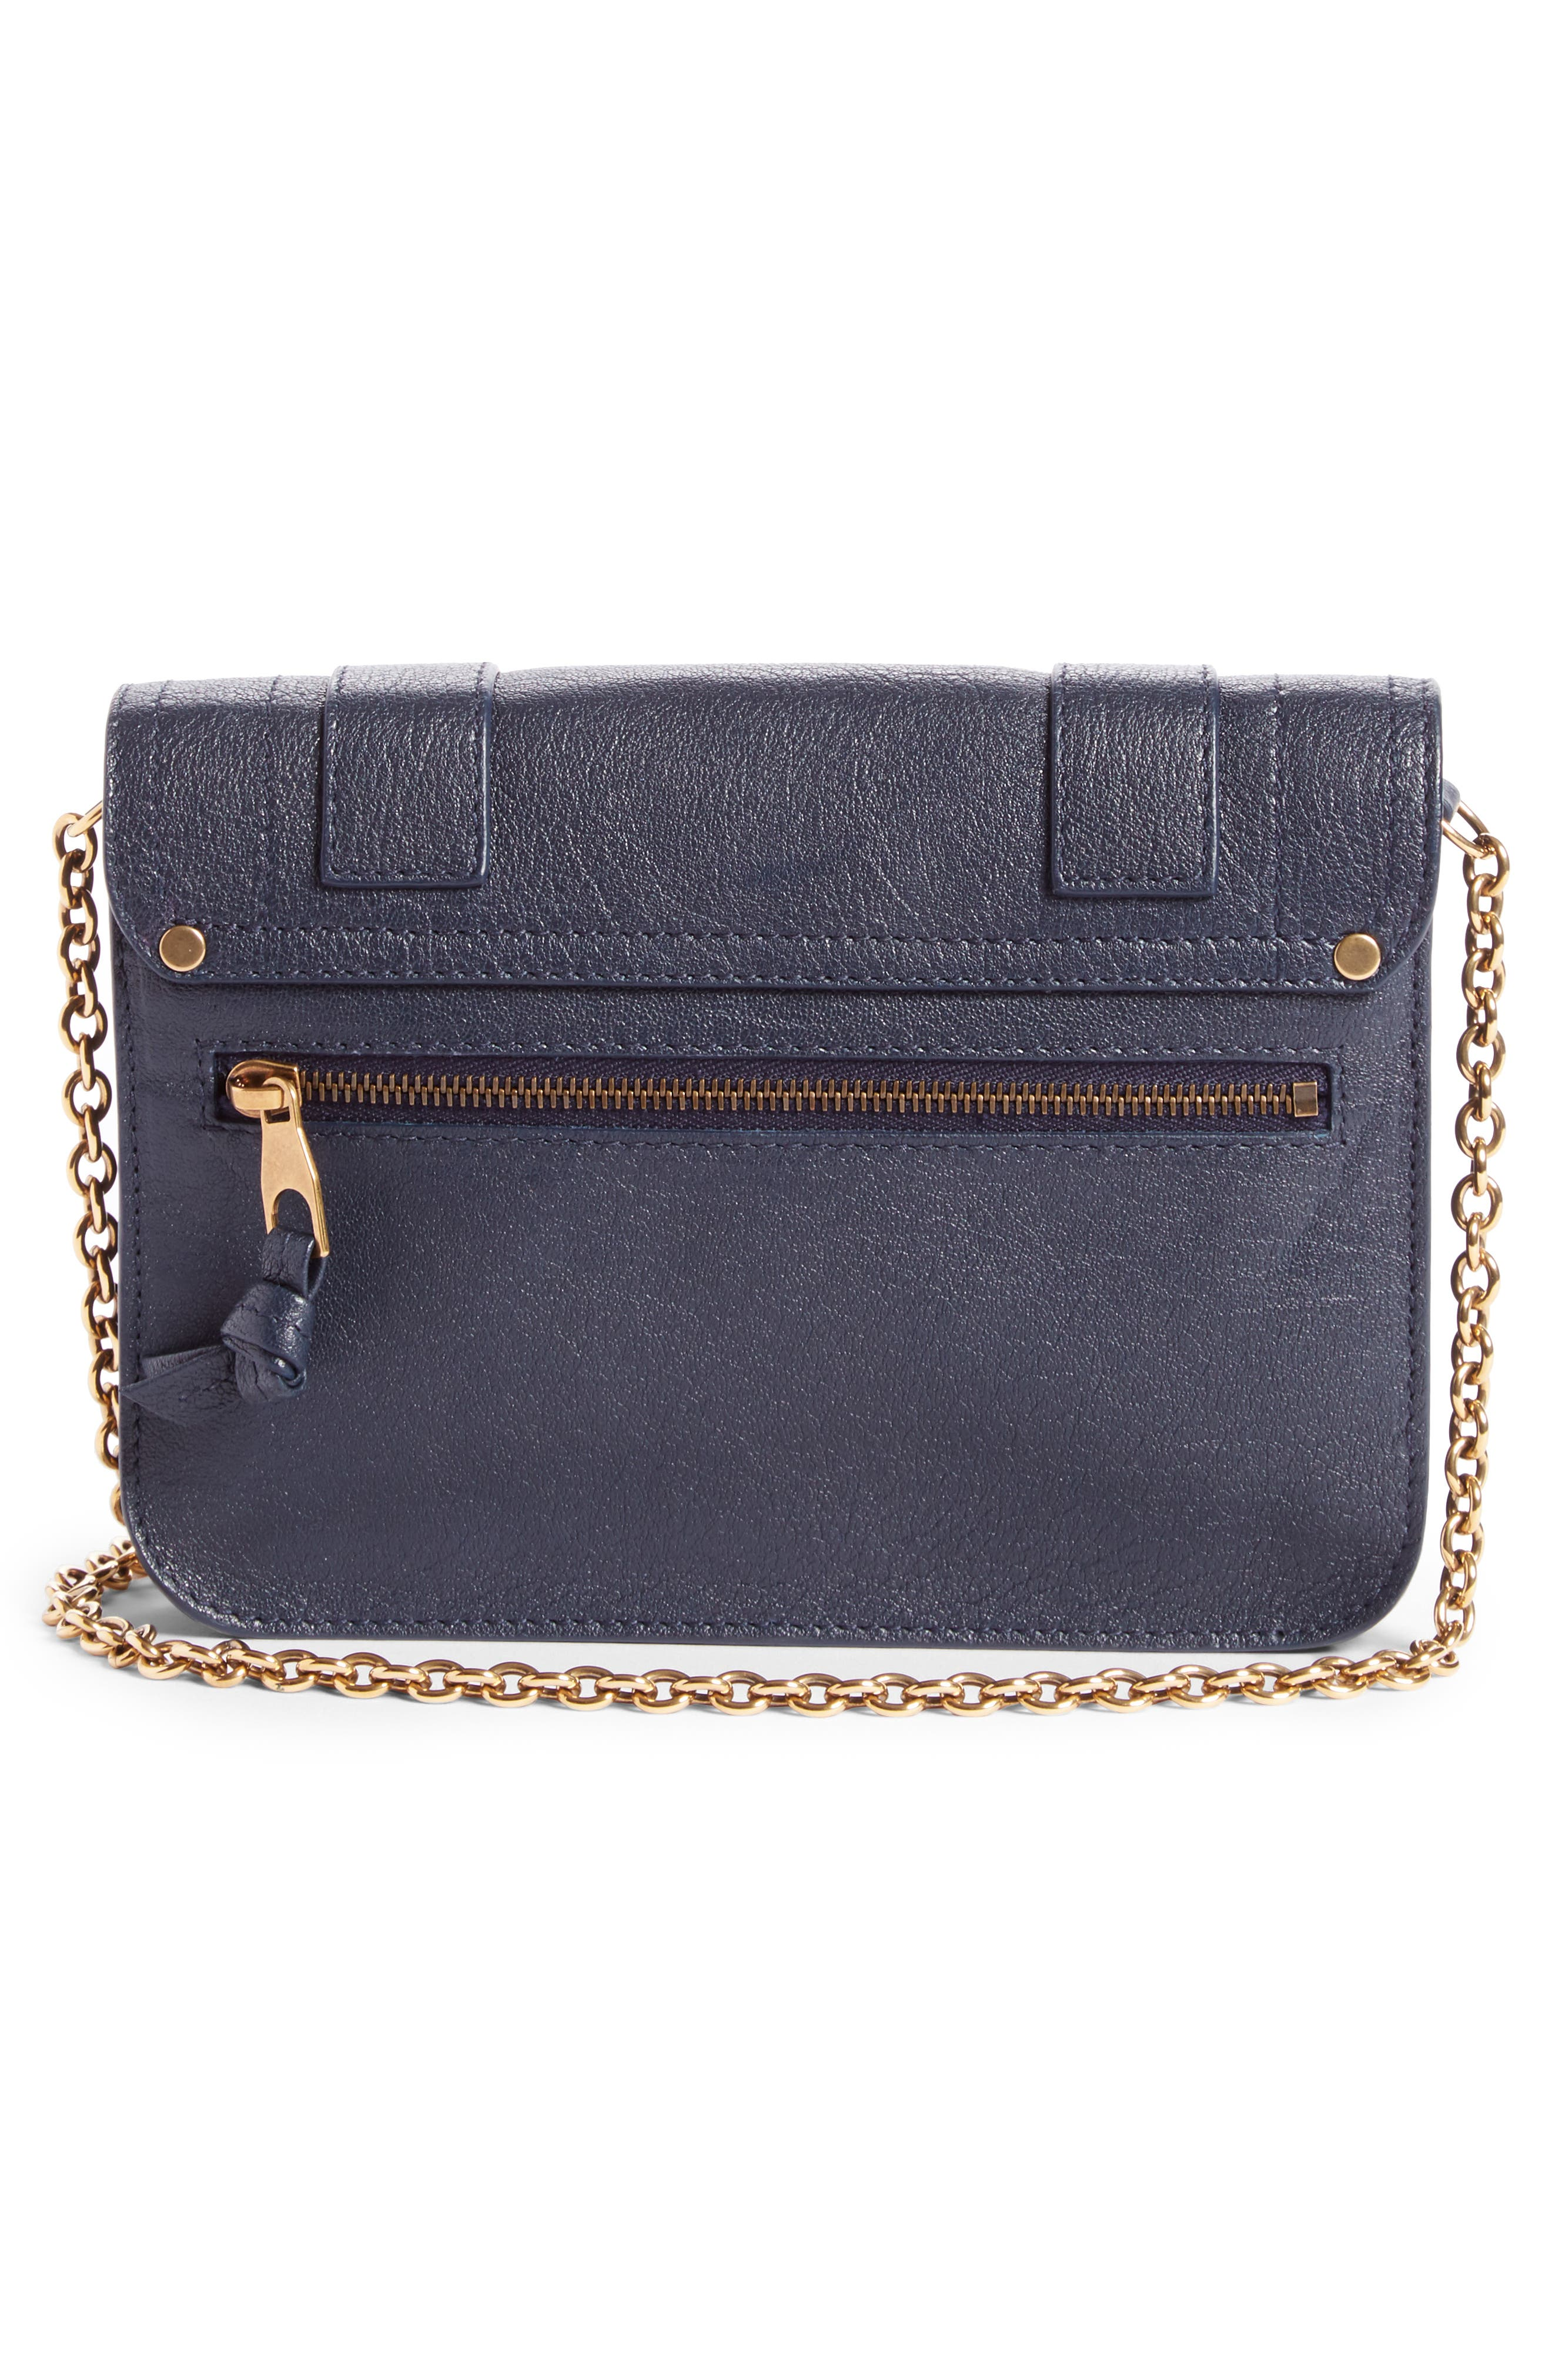 Alternate Image 3  - Proenza Schouler PS1 Lambskin Leather Chain Wallet